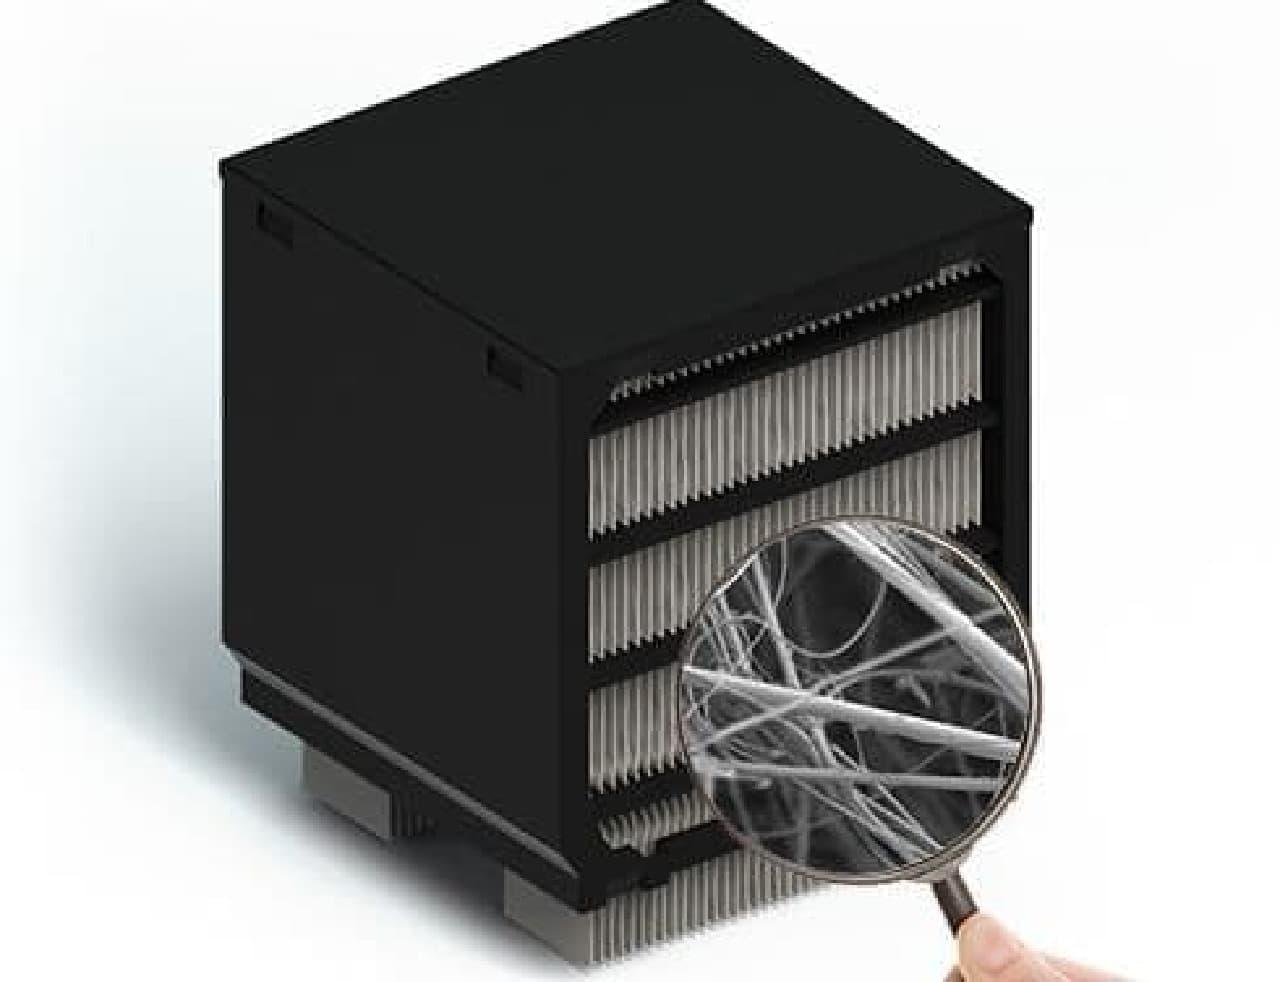 USB電源で動作するクーラー「Evapolar」